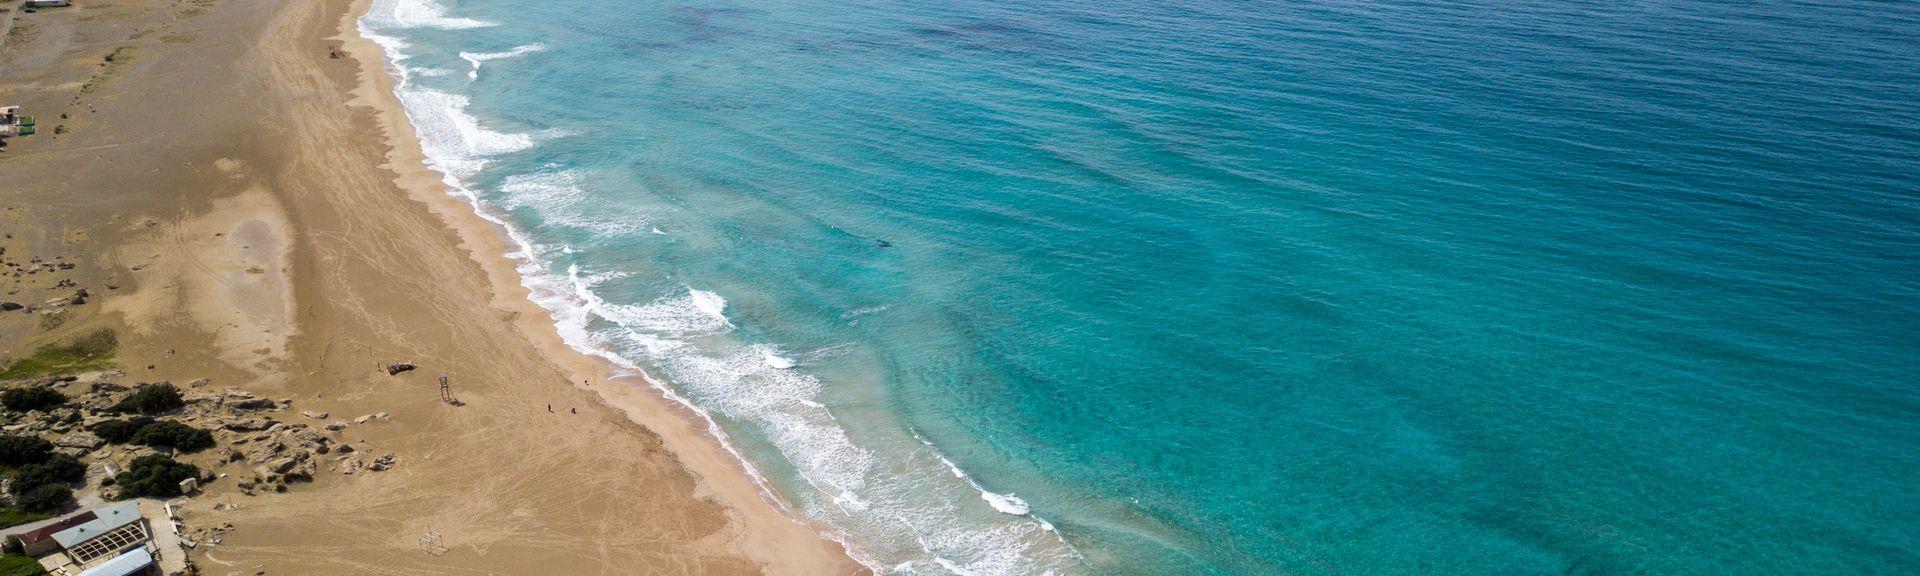 Elafonissi Beach, Kissamos, Crete, Greece